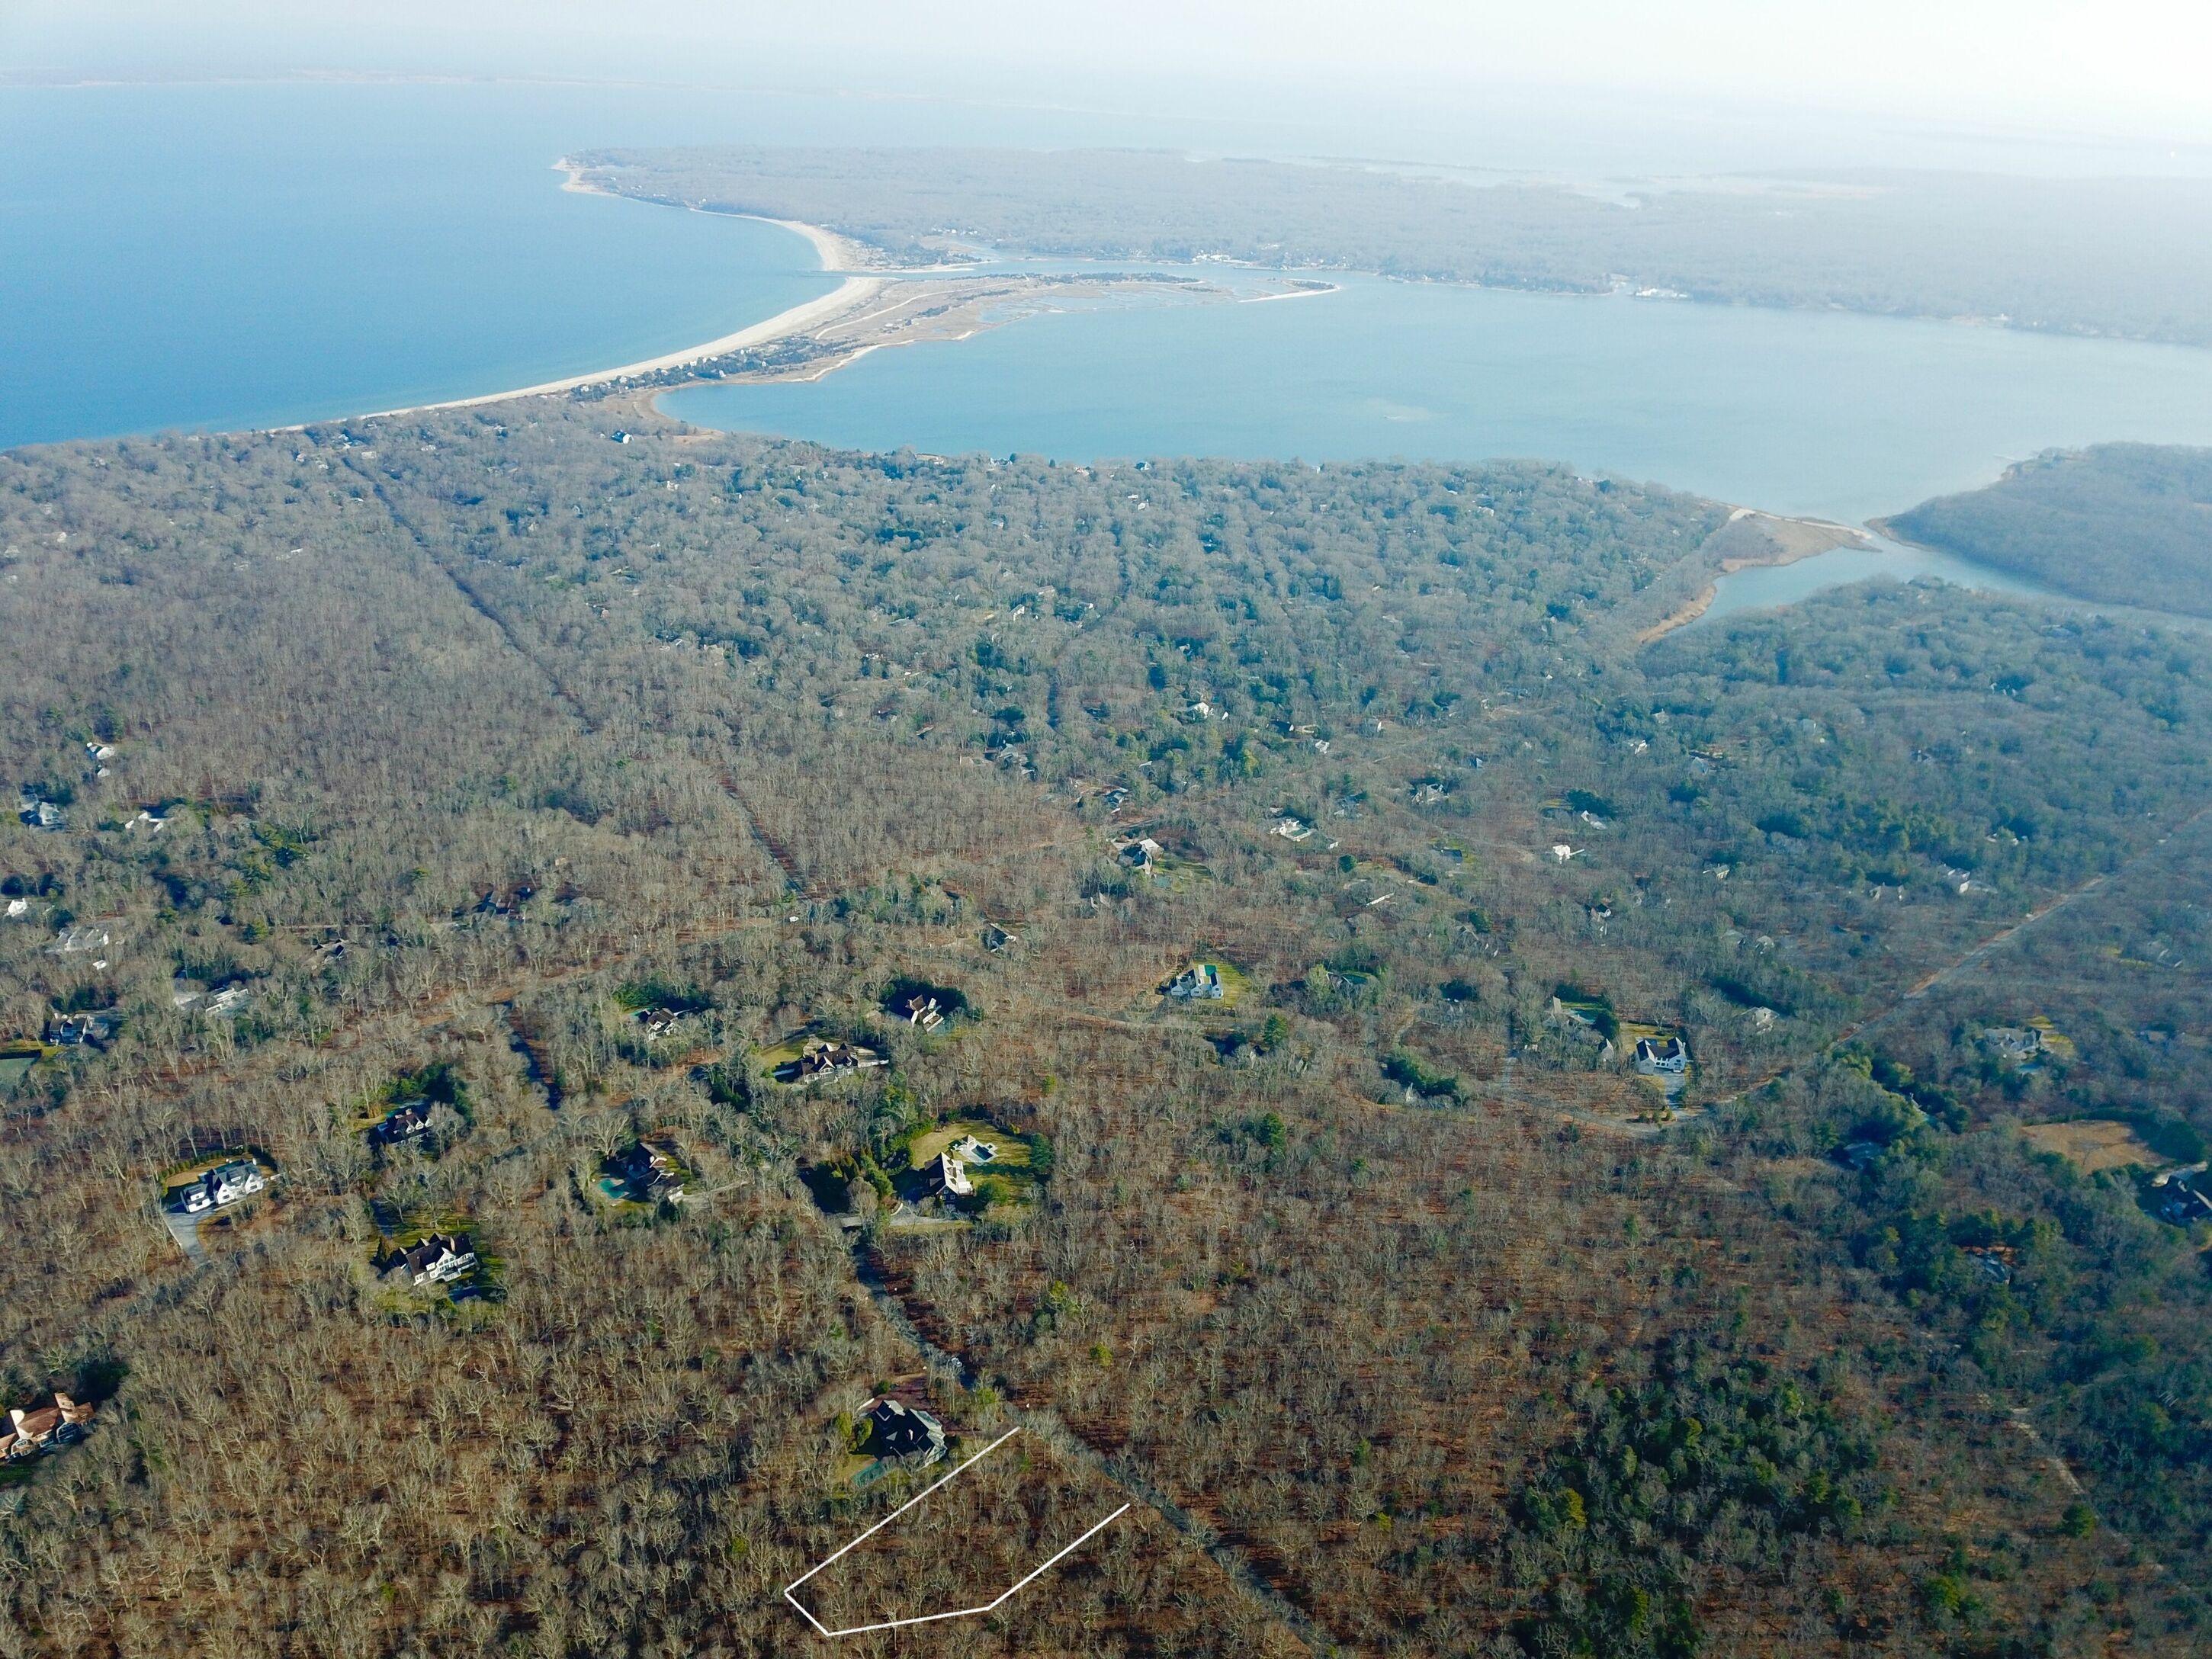 8 Great Oak Way - East Hampton NW, New York